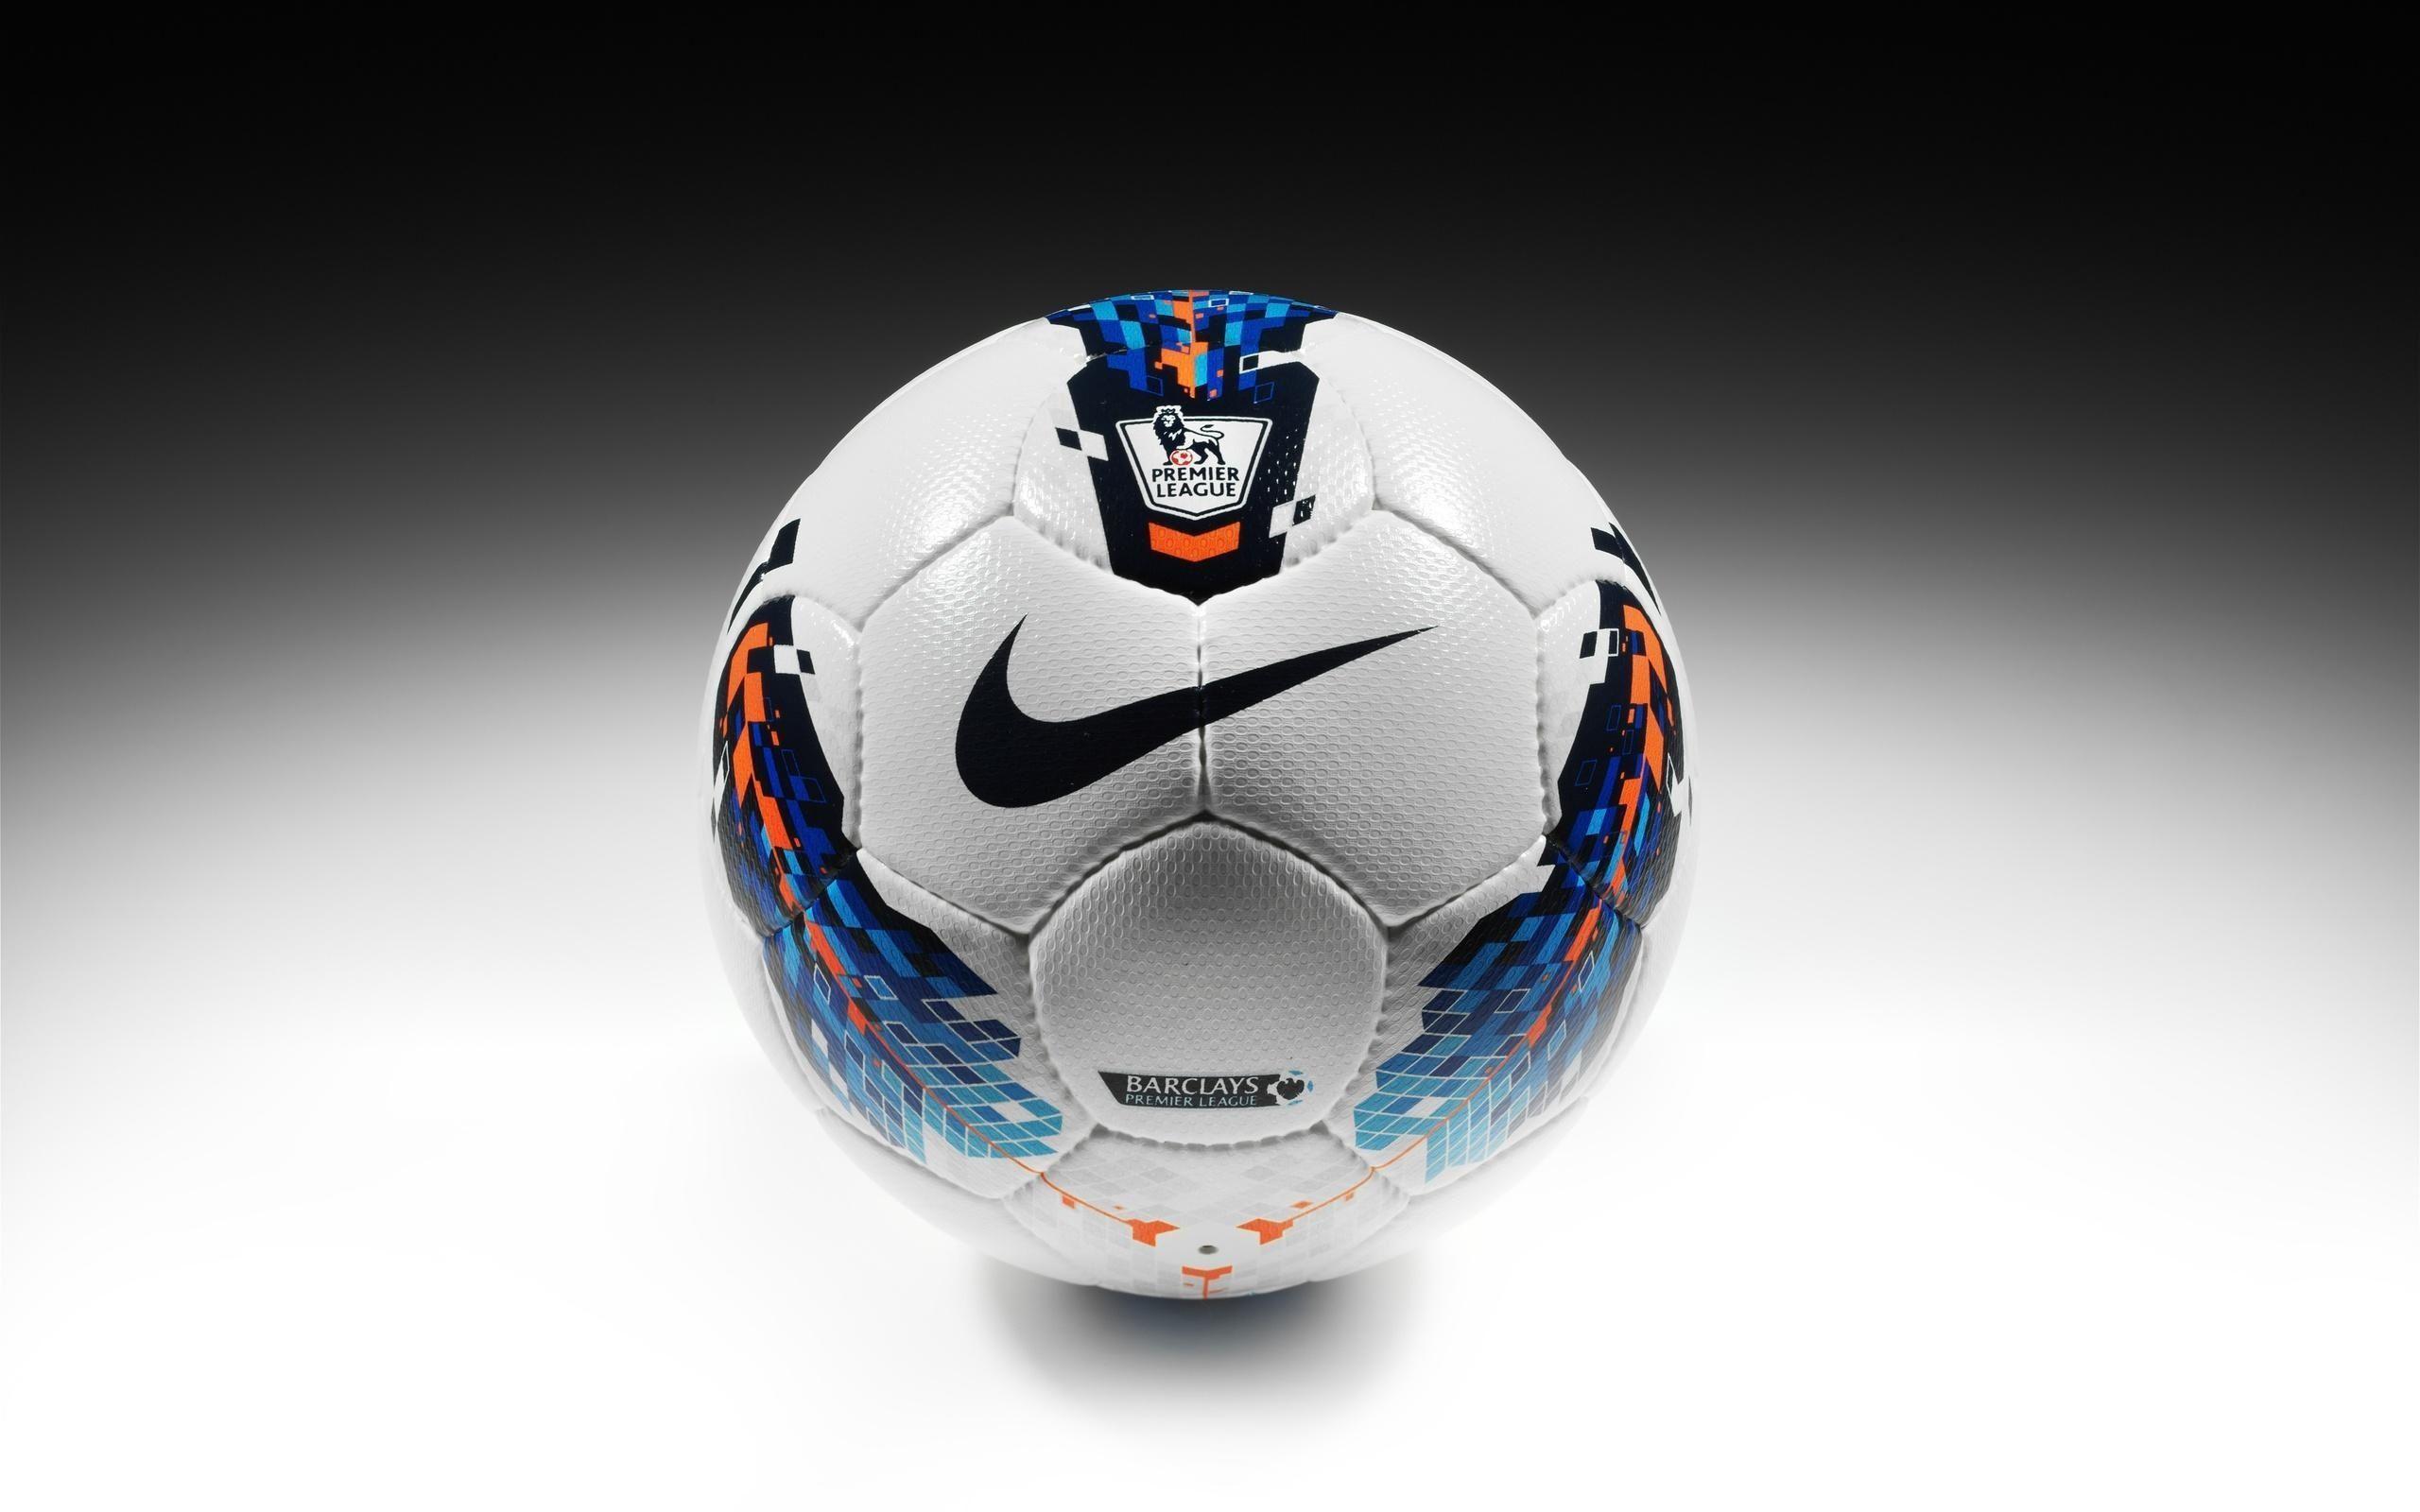 Download Wallpaper High Quality Football - a1af6d94e68c140e19b823337ca1aa25  Snapshot_13877.jpg